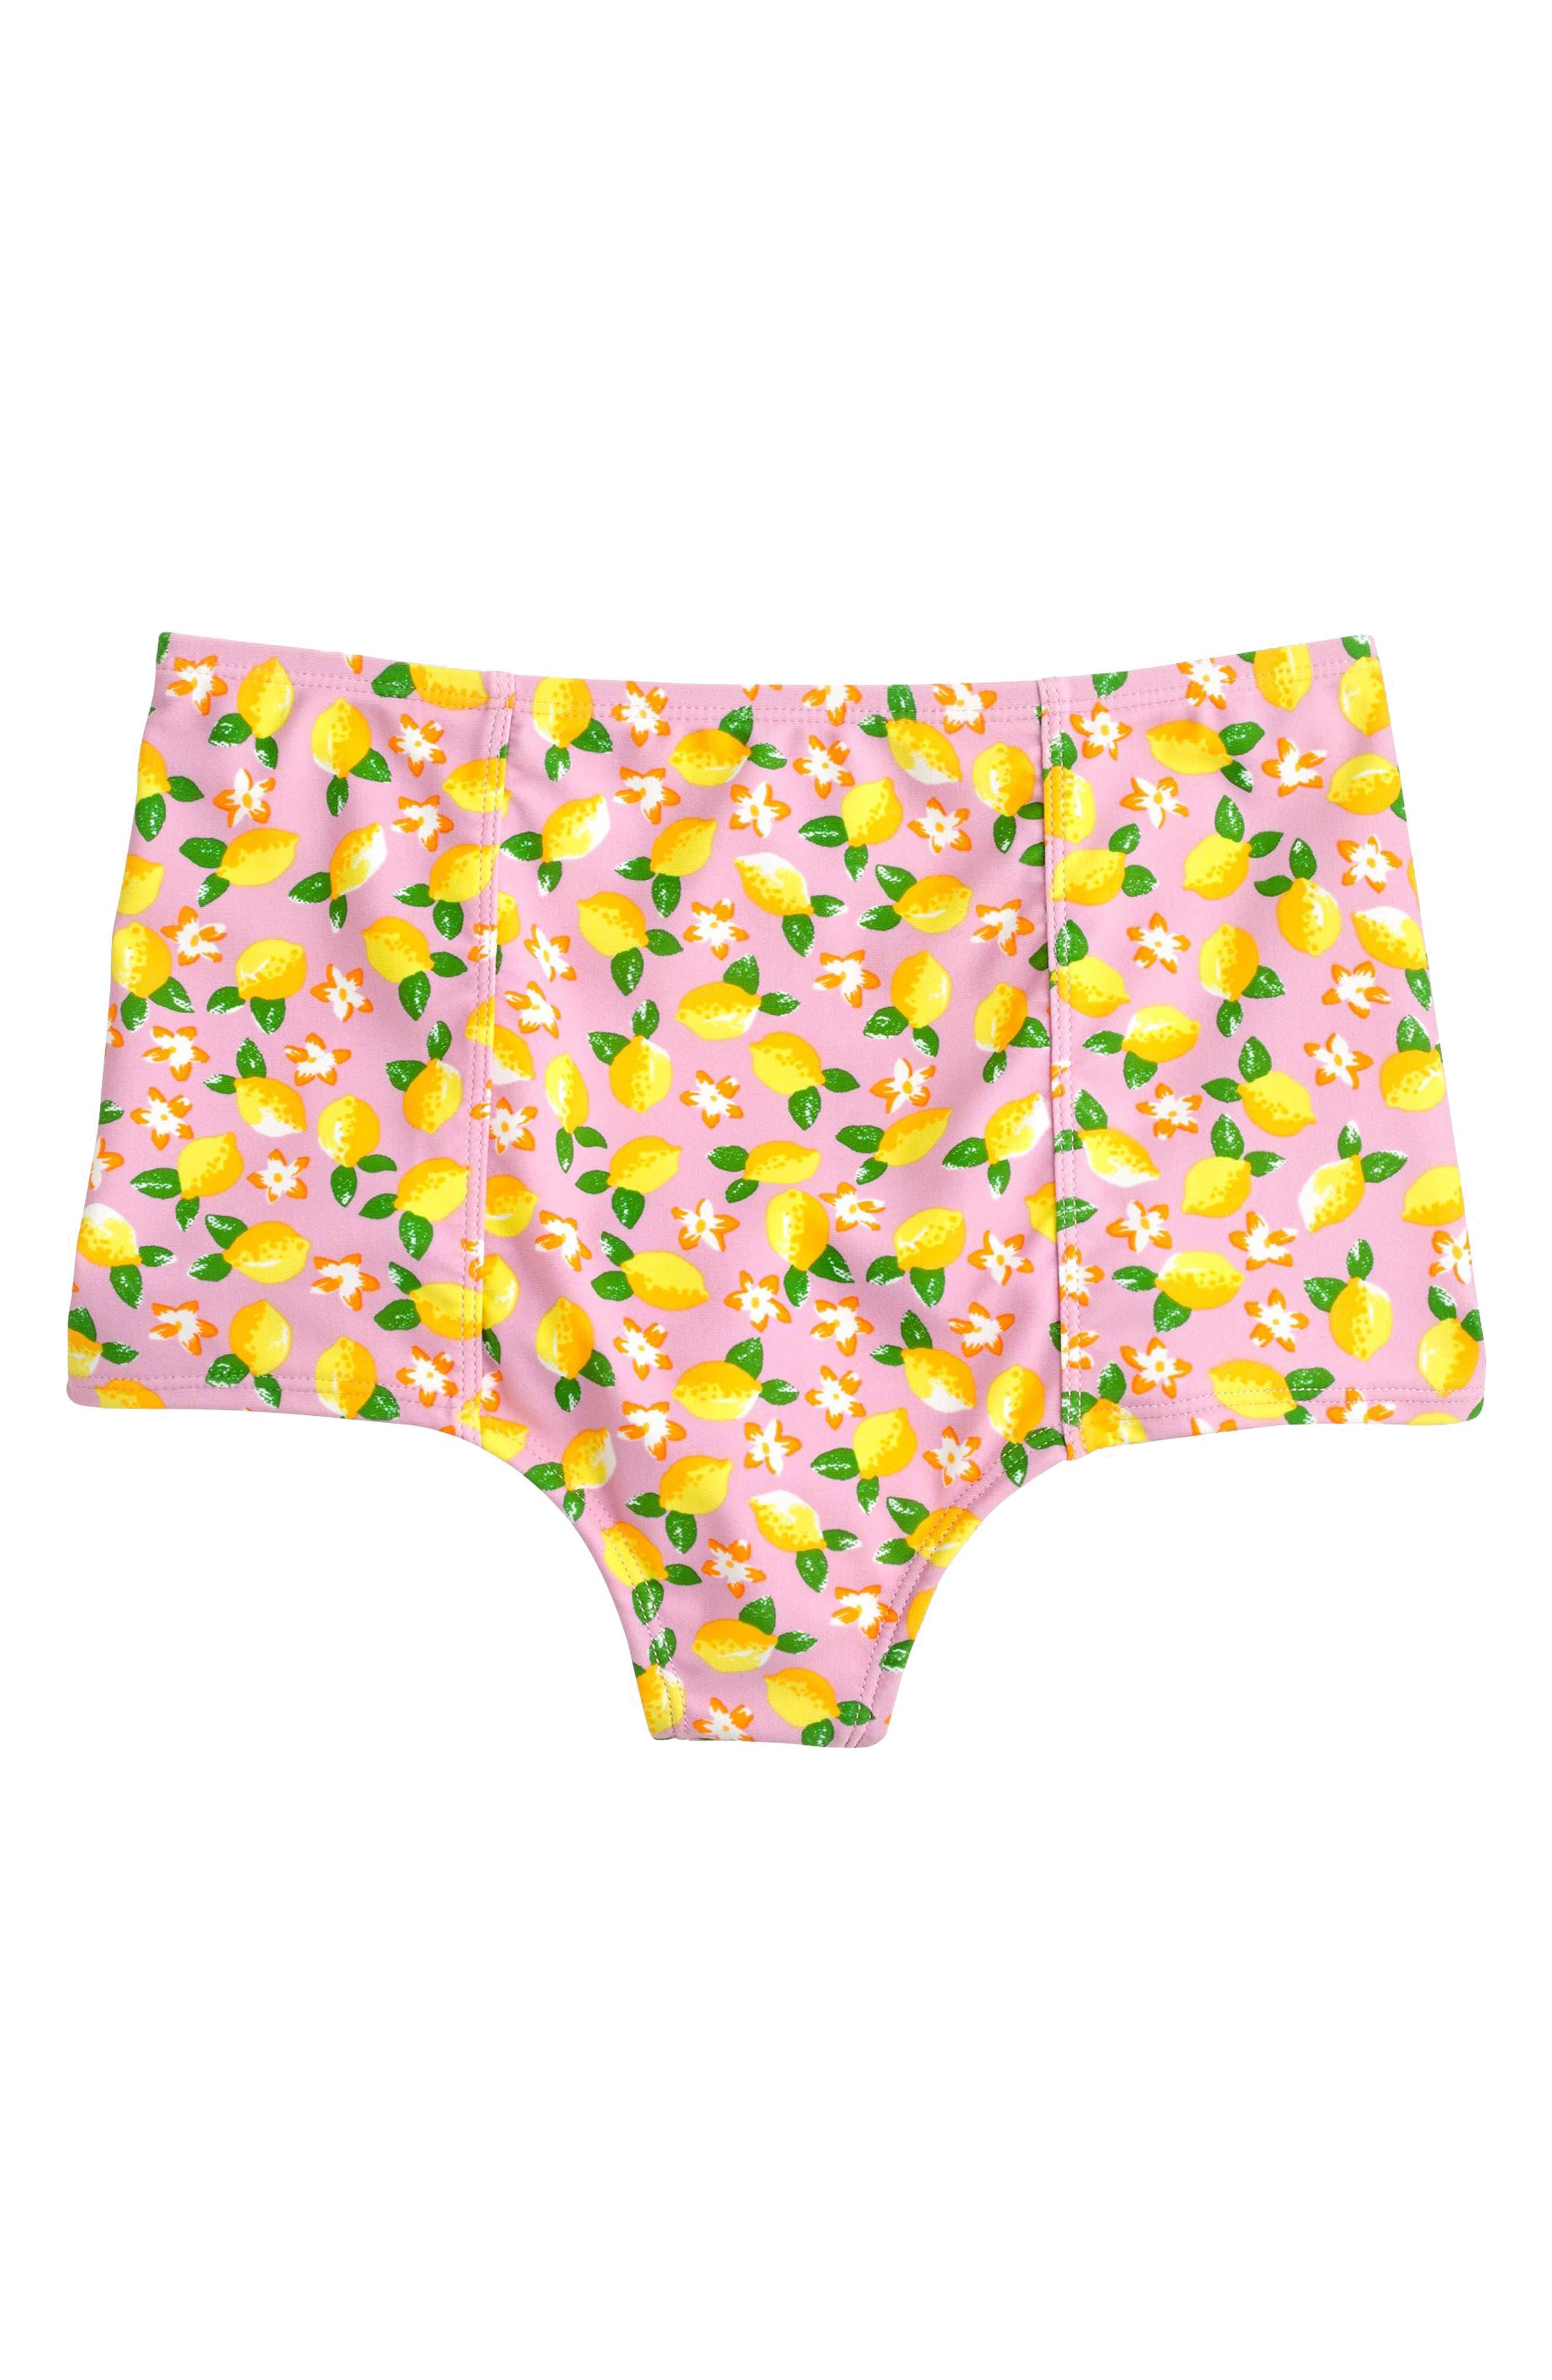 Lemon Print High Waist Bikini Bottoms,                             Alternate thumbnail 3, color,                             702